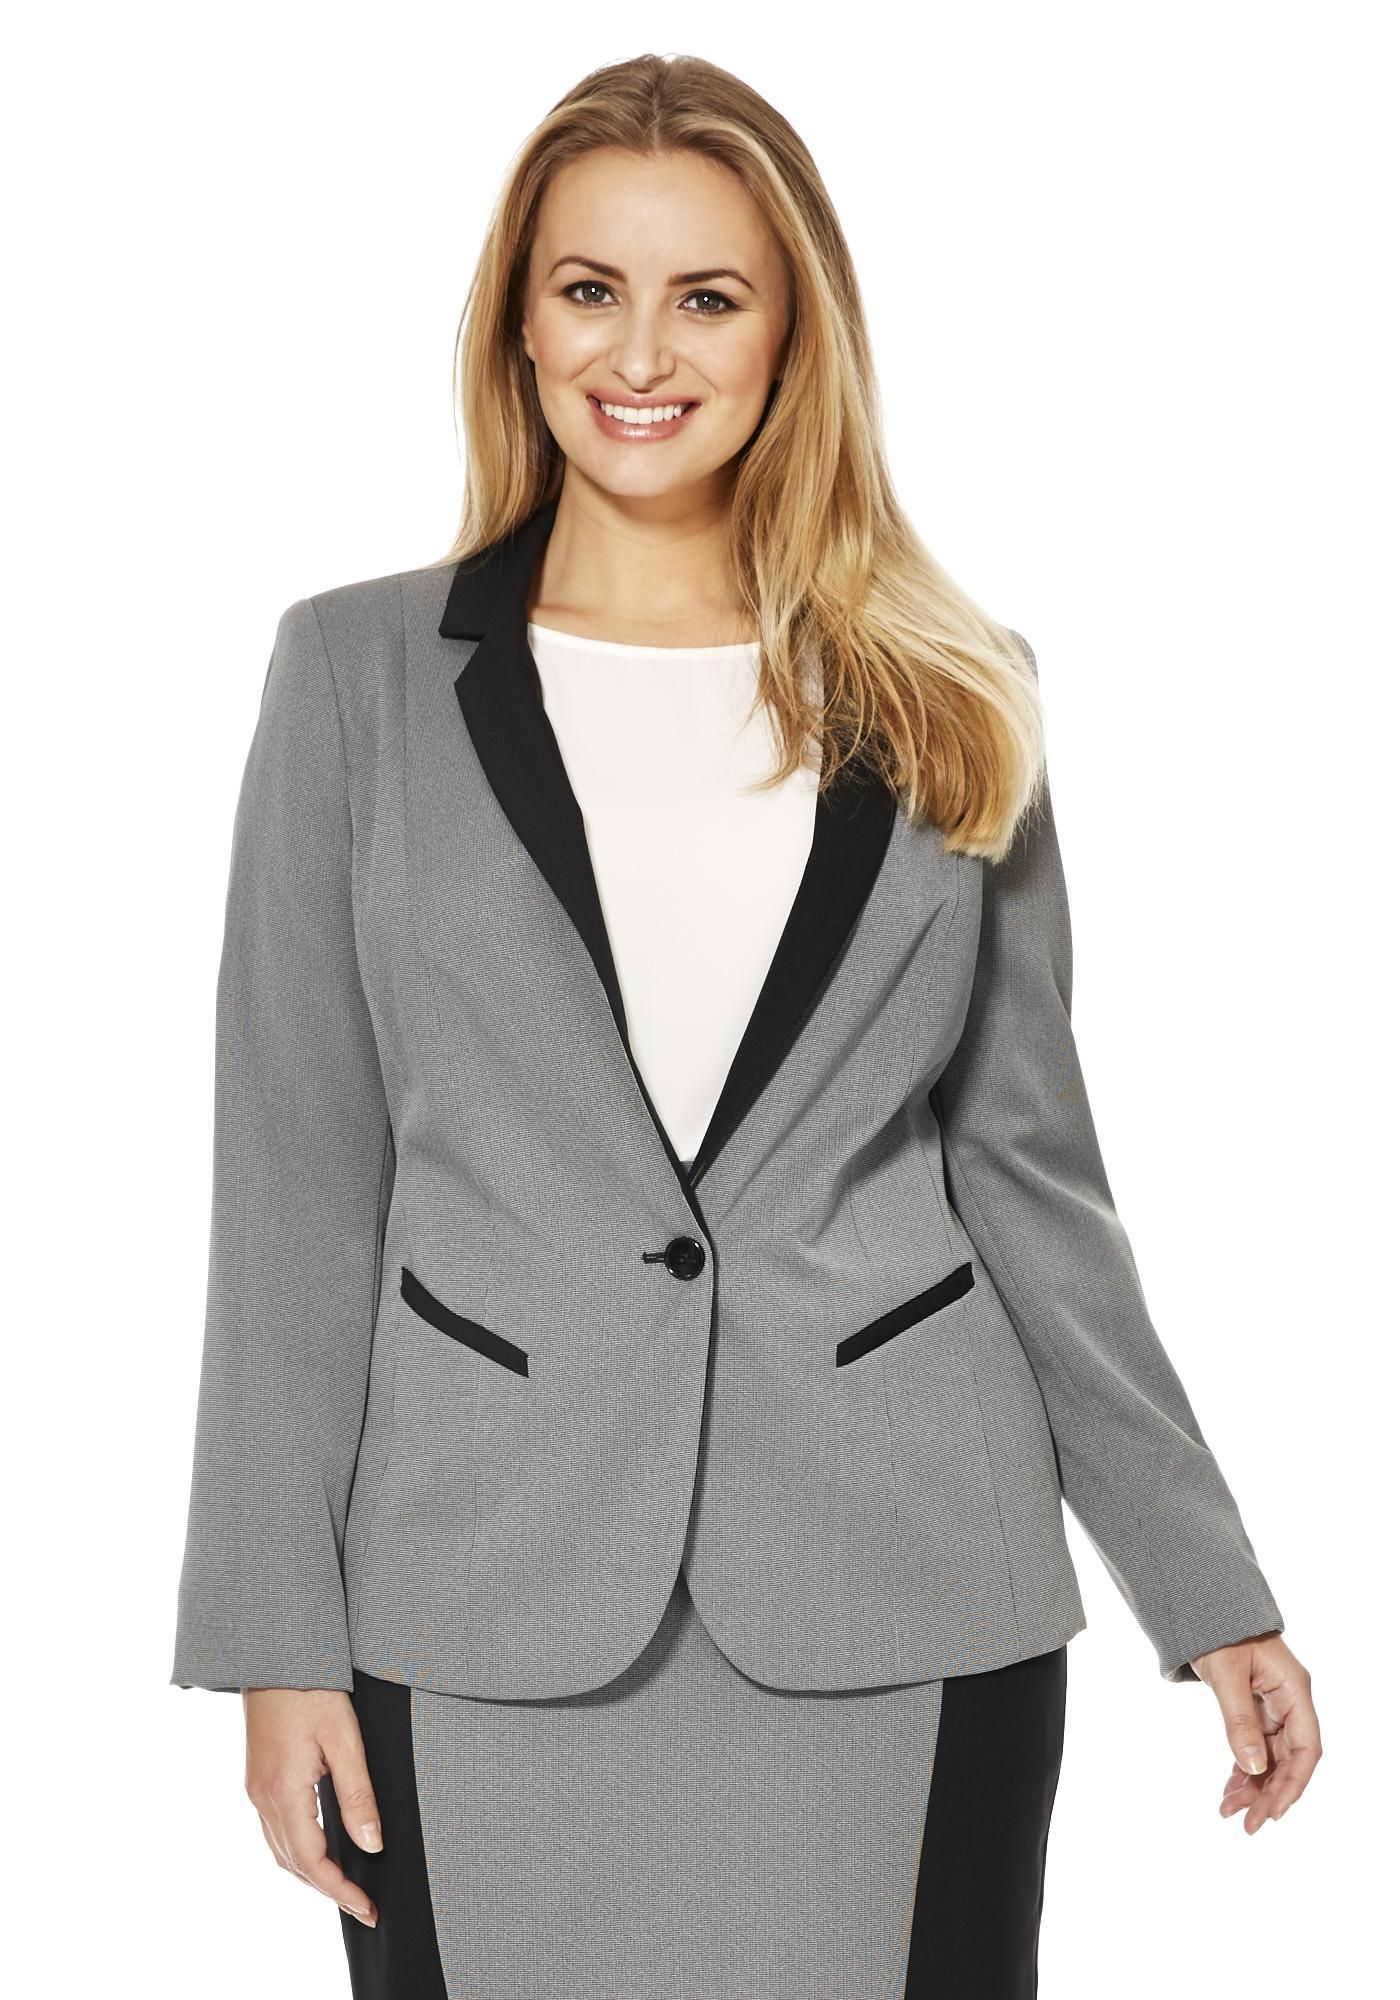 Ff True Fine Check Colour Block Plus Size Suit Jacket Gina Swire